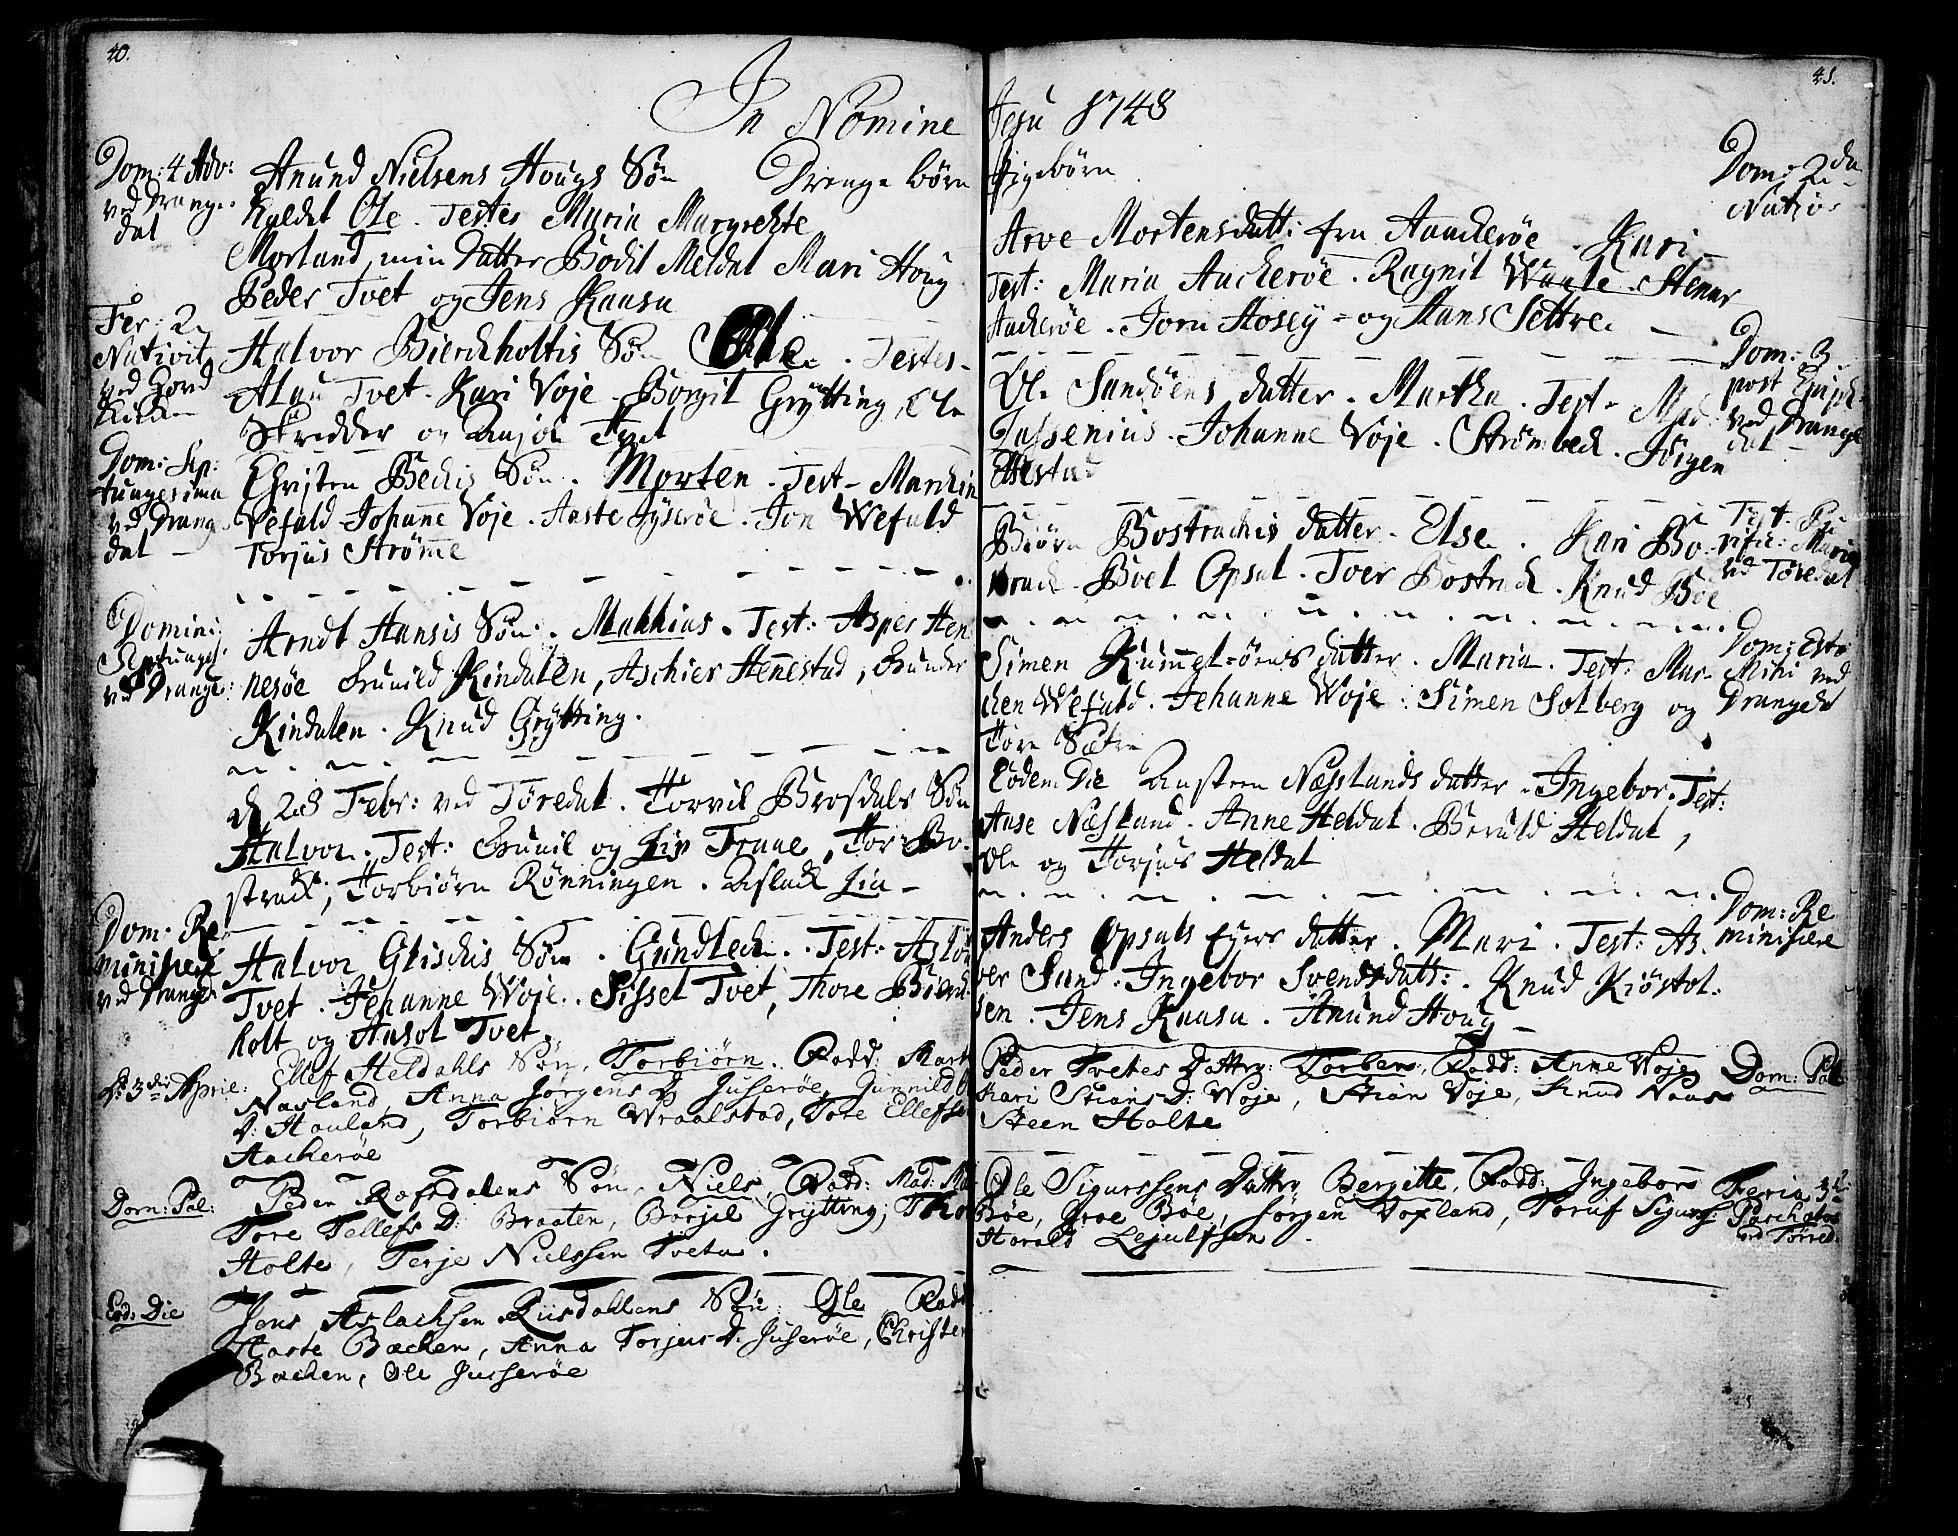 SAKO, Drangedal kirkebøker, F/Fa/L0001: Ministerialbok nr. 1, 1697-1767, s. 40-41